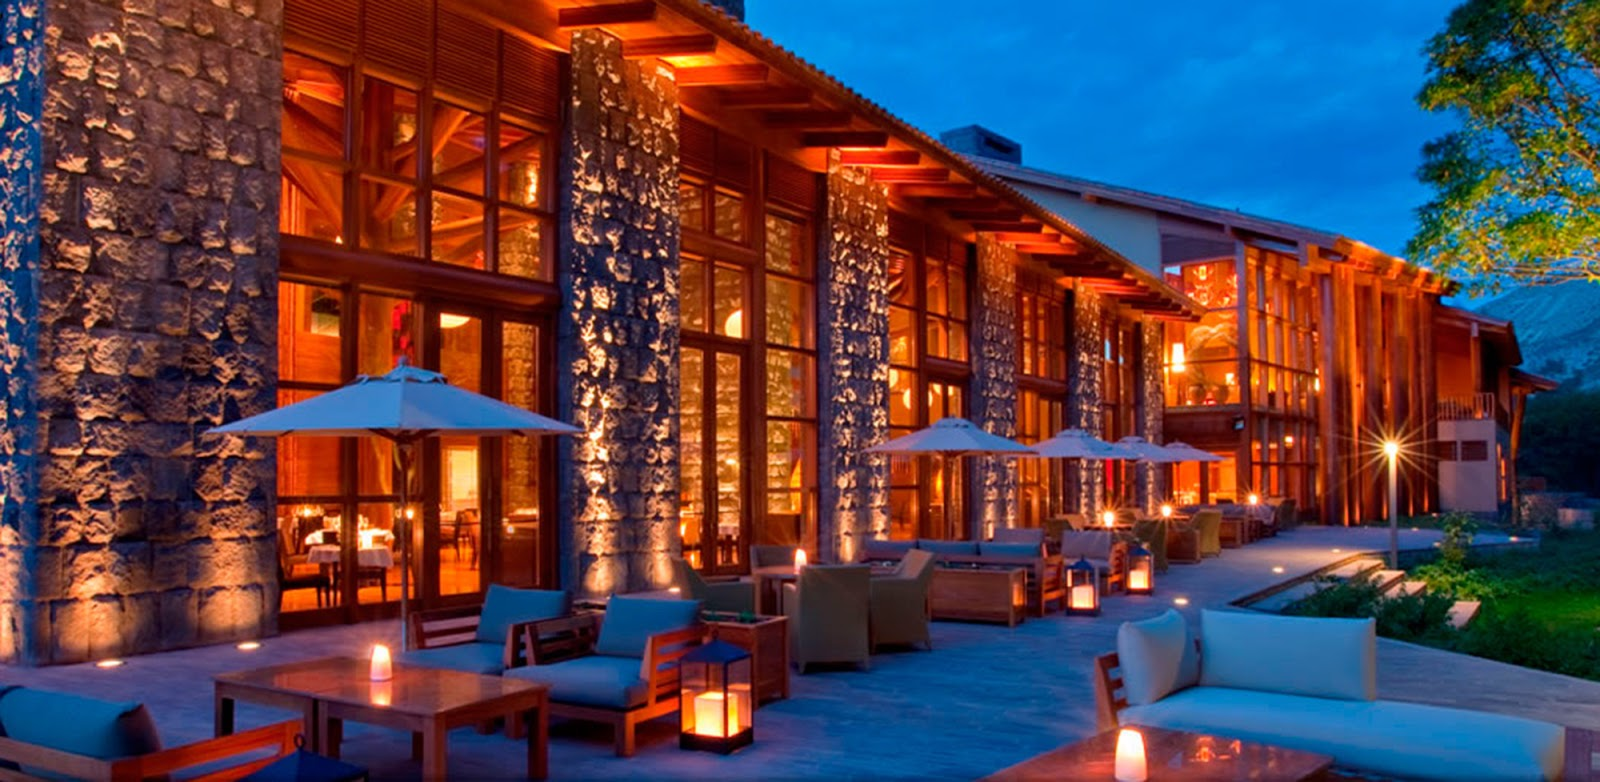 Revista lobby remasterizados for Hotel luxury cusco